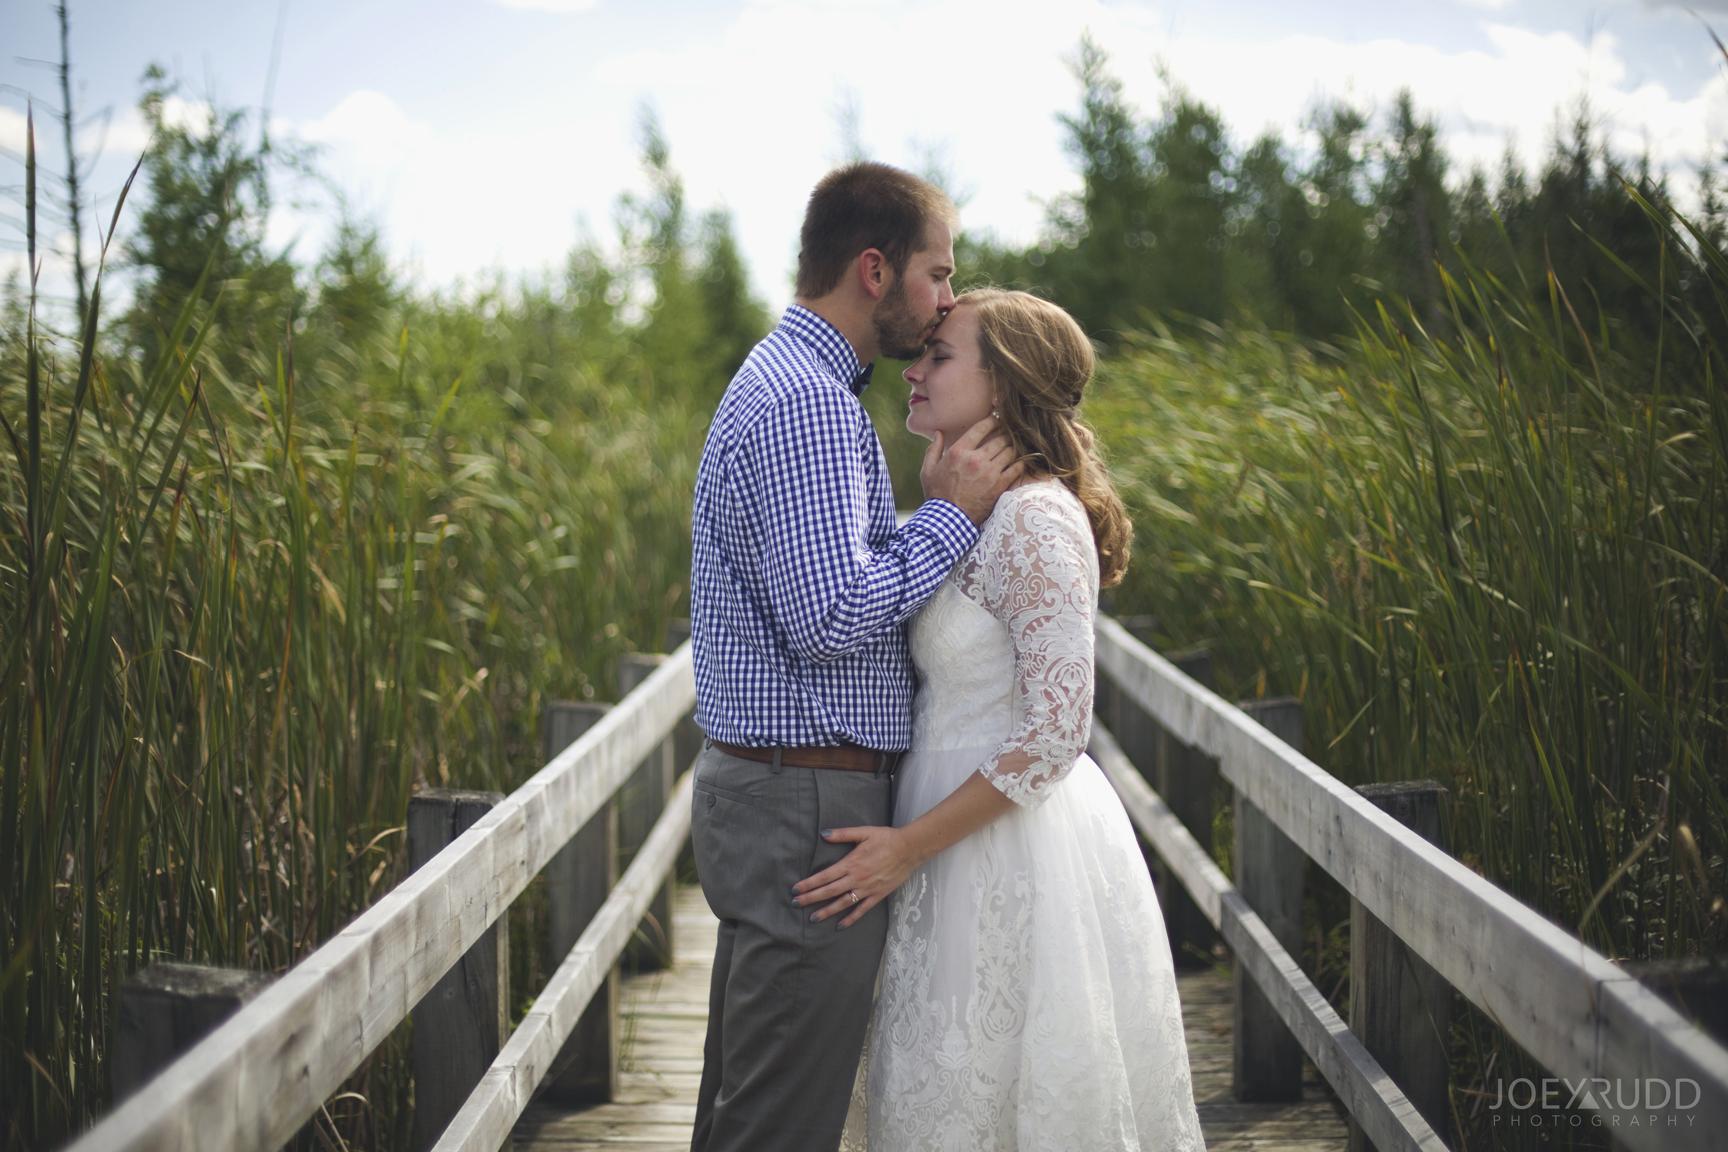 Ottawa Elopement by Joey Rudd Photography Ottawa Wedding Photographer Mer Bleue Ottawa Wedding Chapel Bog Trail